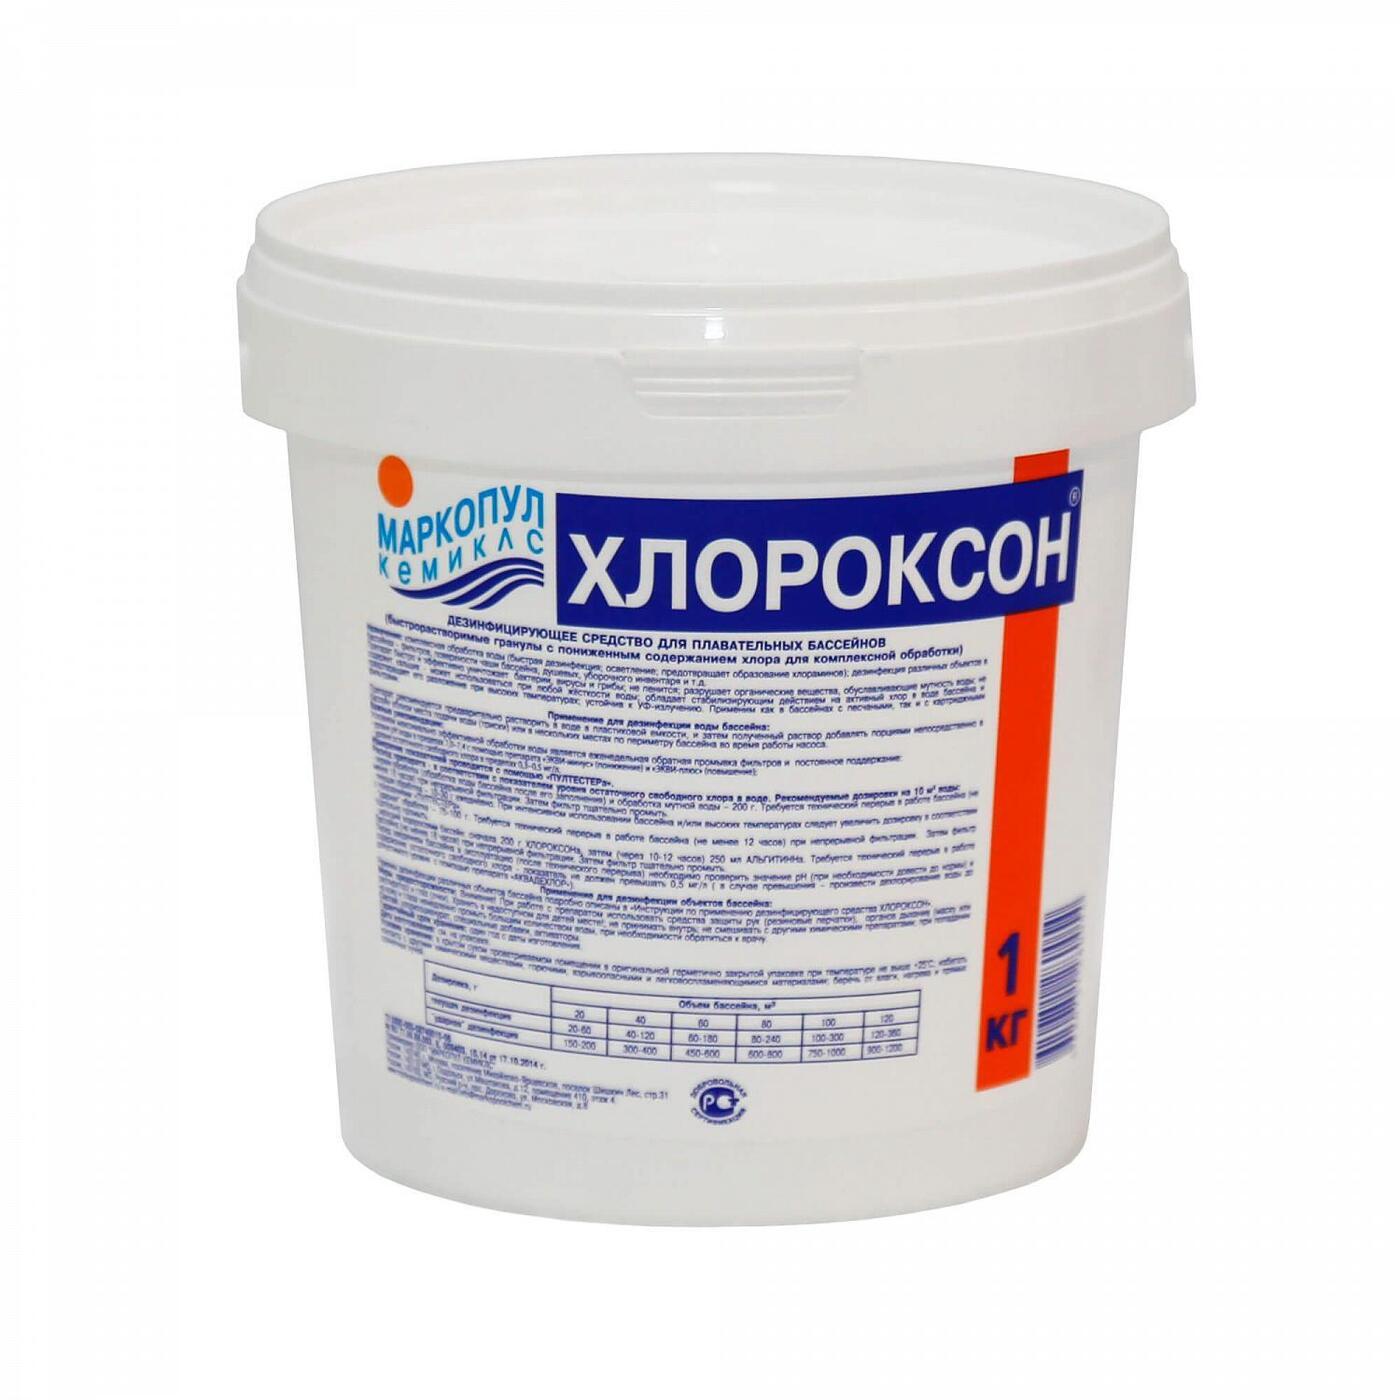 Маркопул Кемикас - Хлороксон